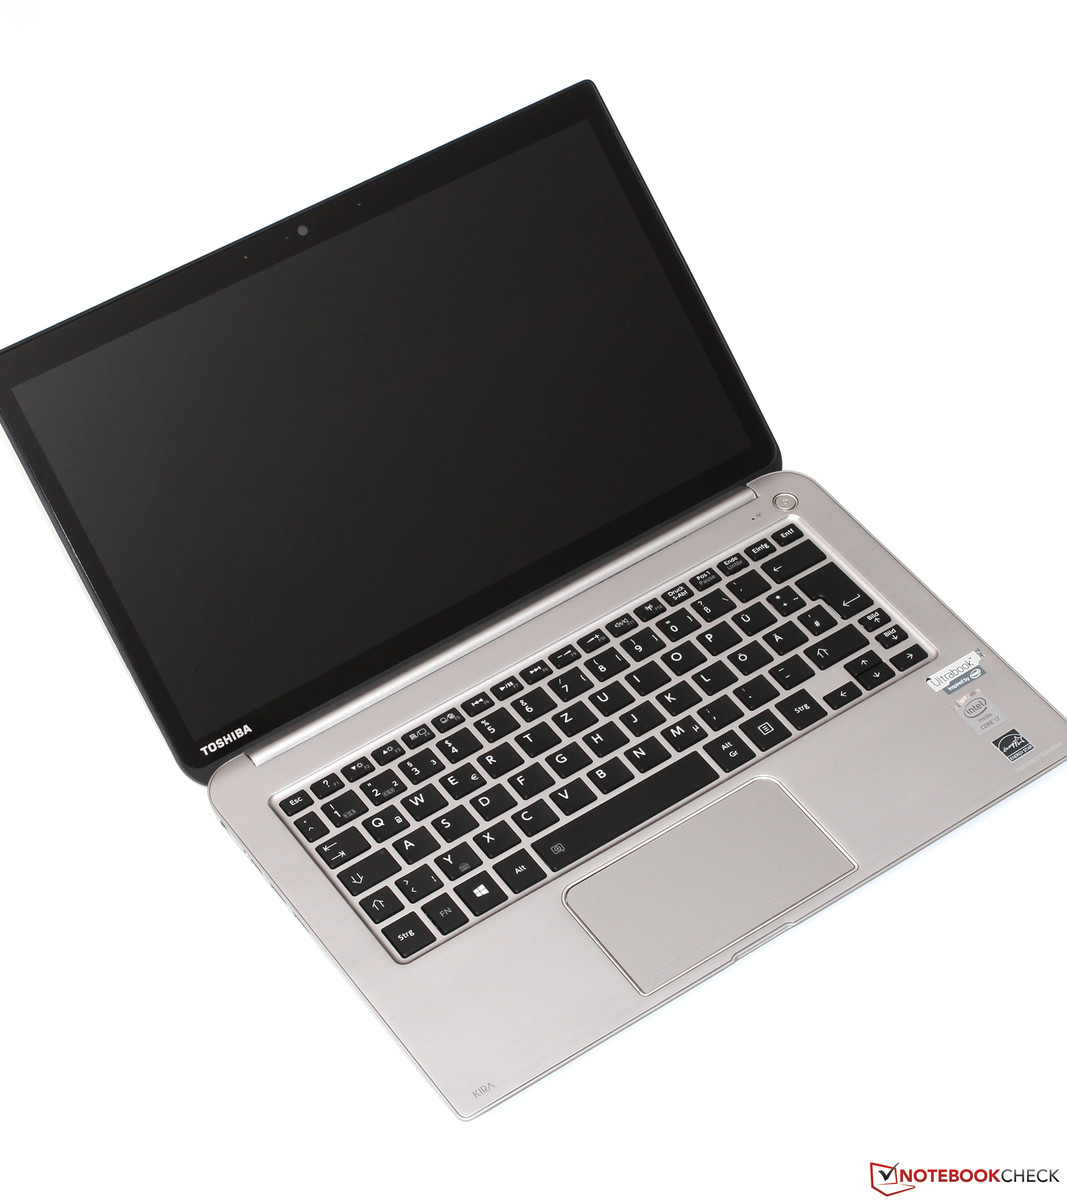 Toshiba KIRAbook (KIRA-101) Ultrabook Review ...